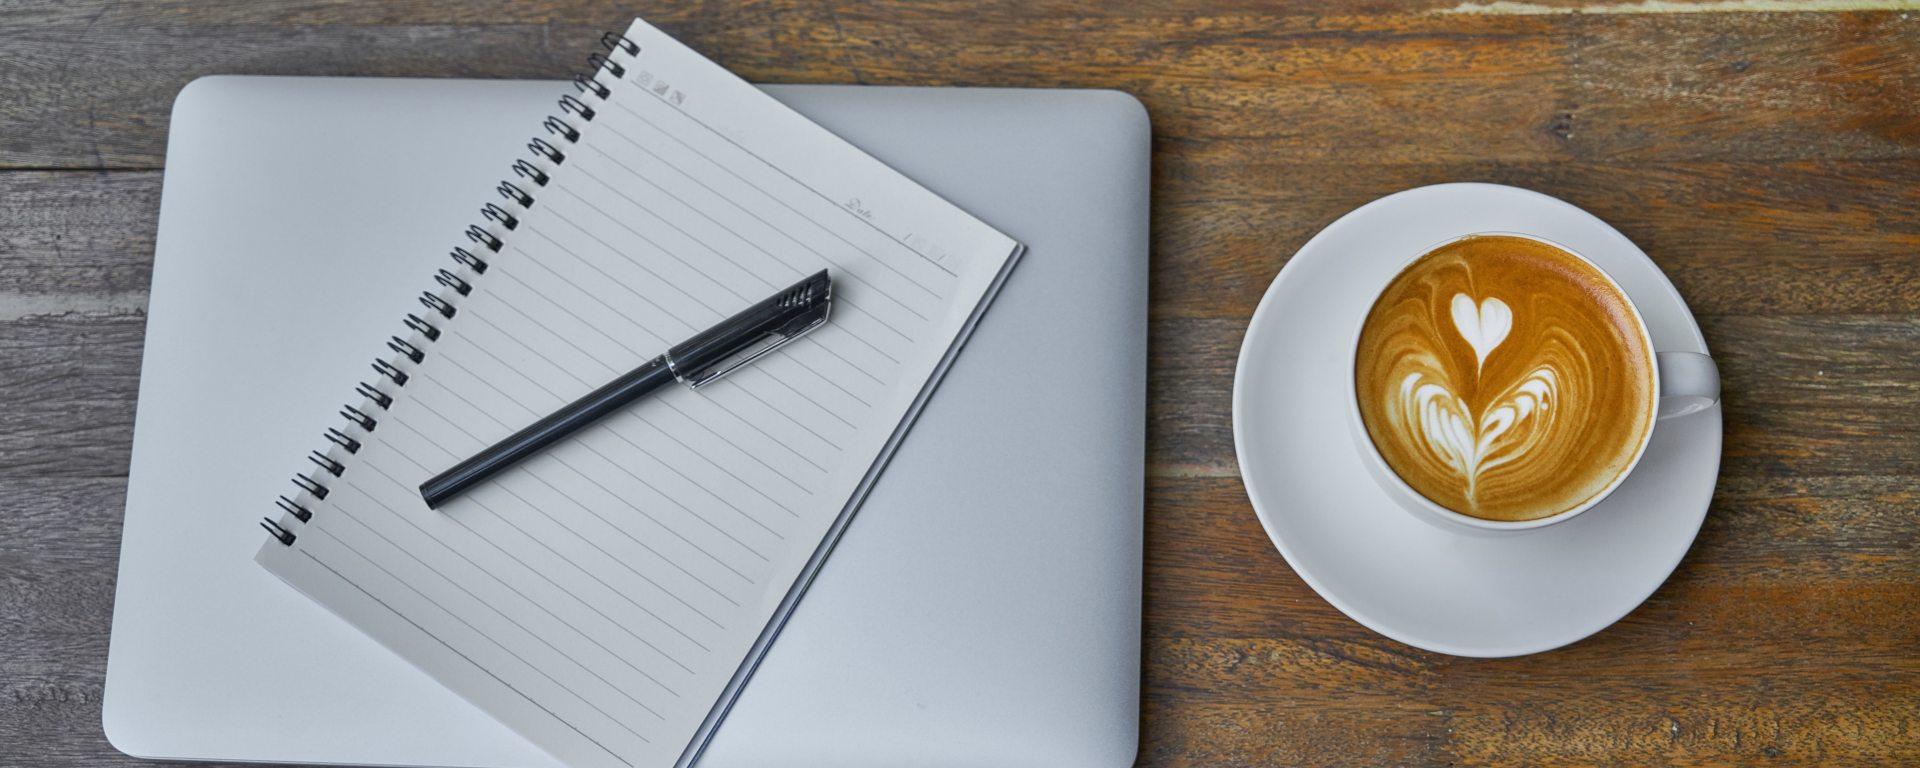 Writing, coffee, planning